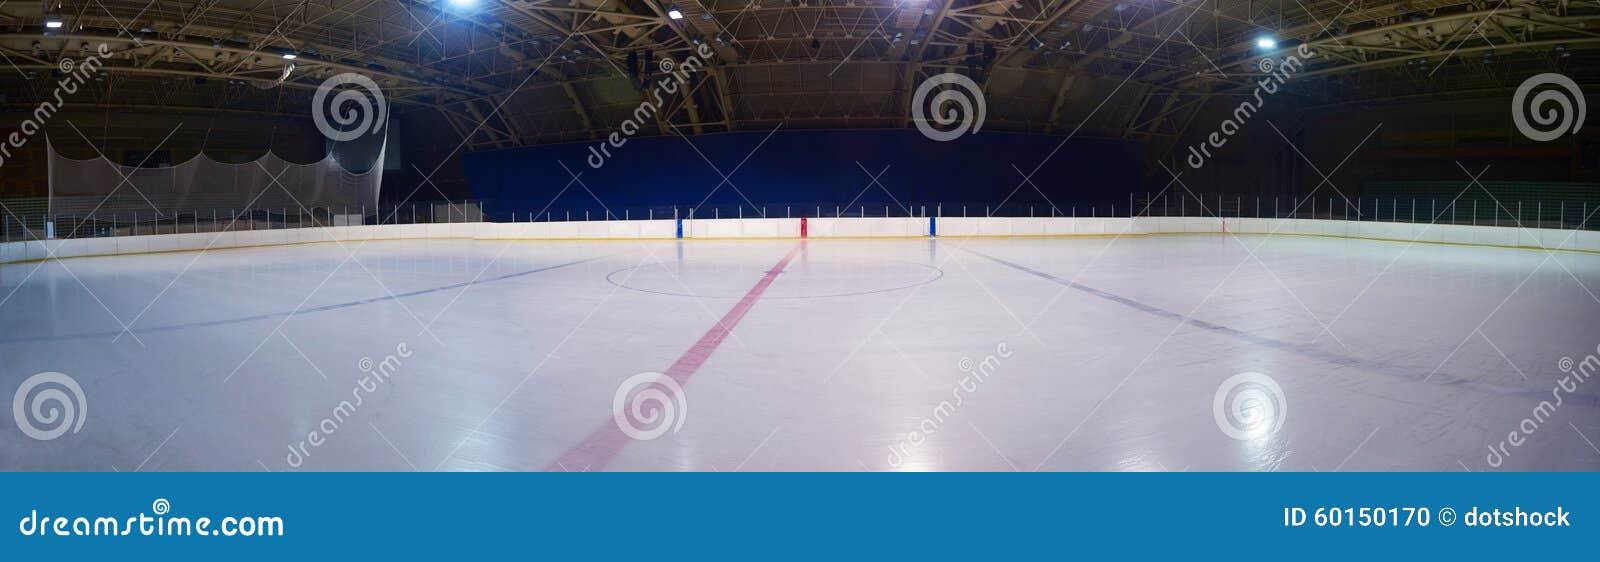 Patinoire vide, arène d hockey